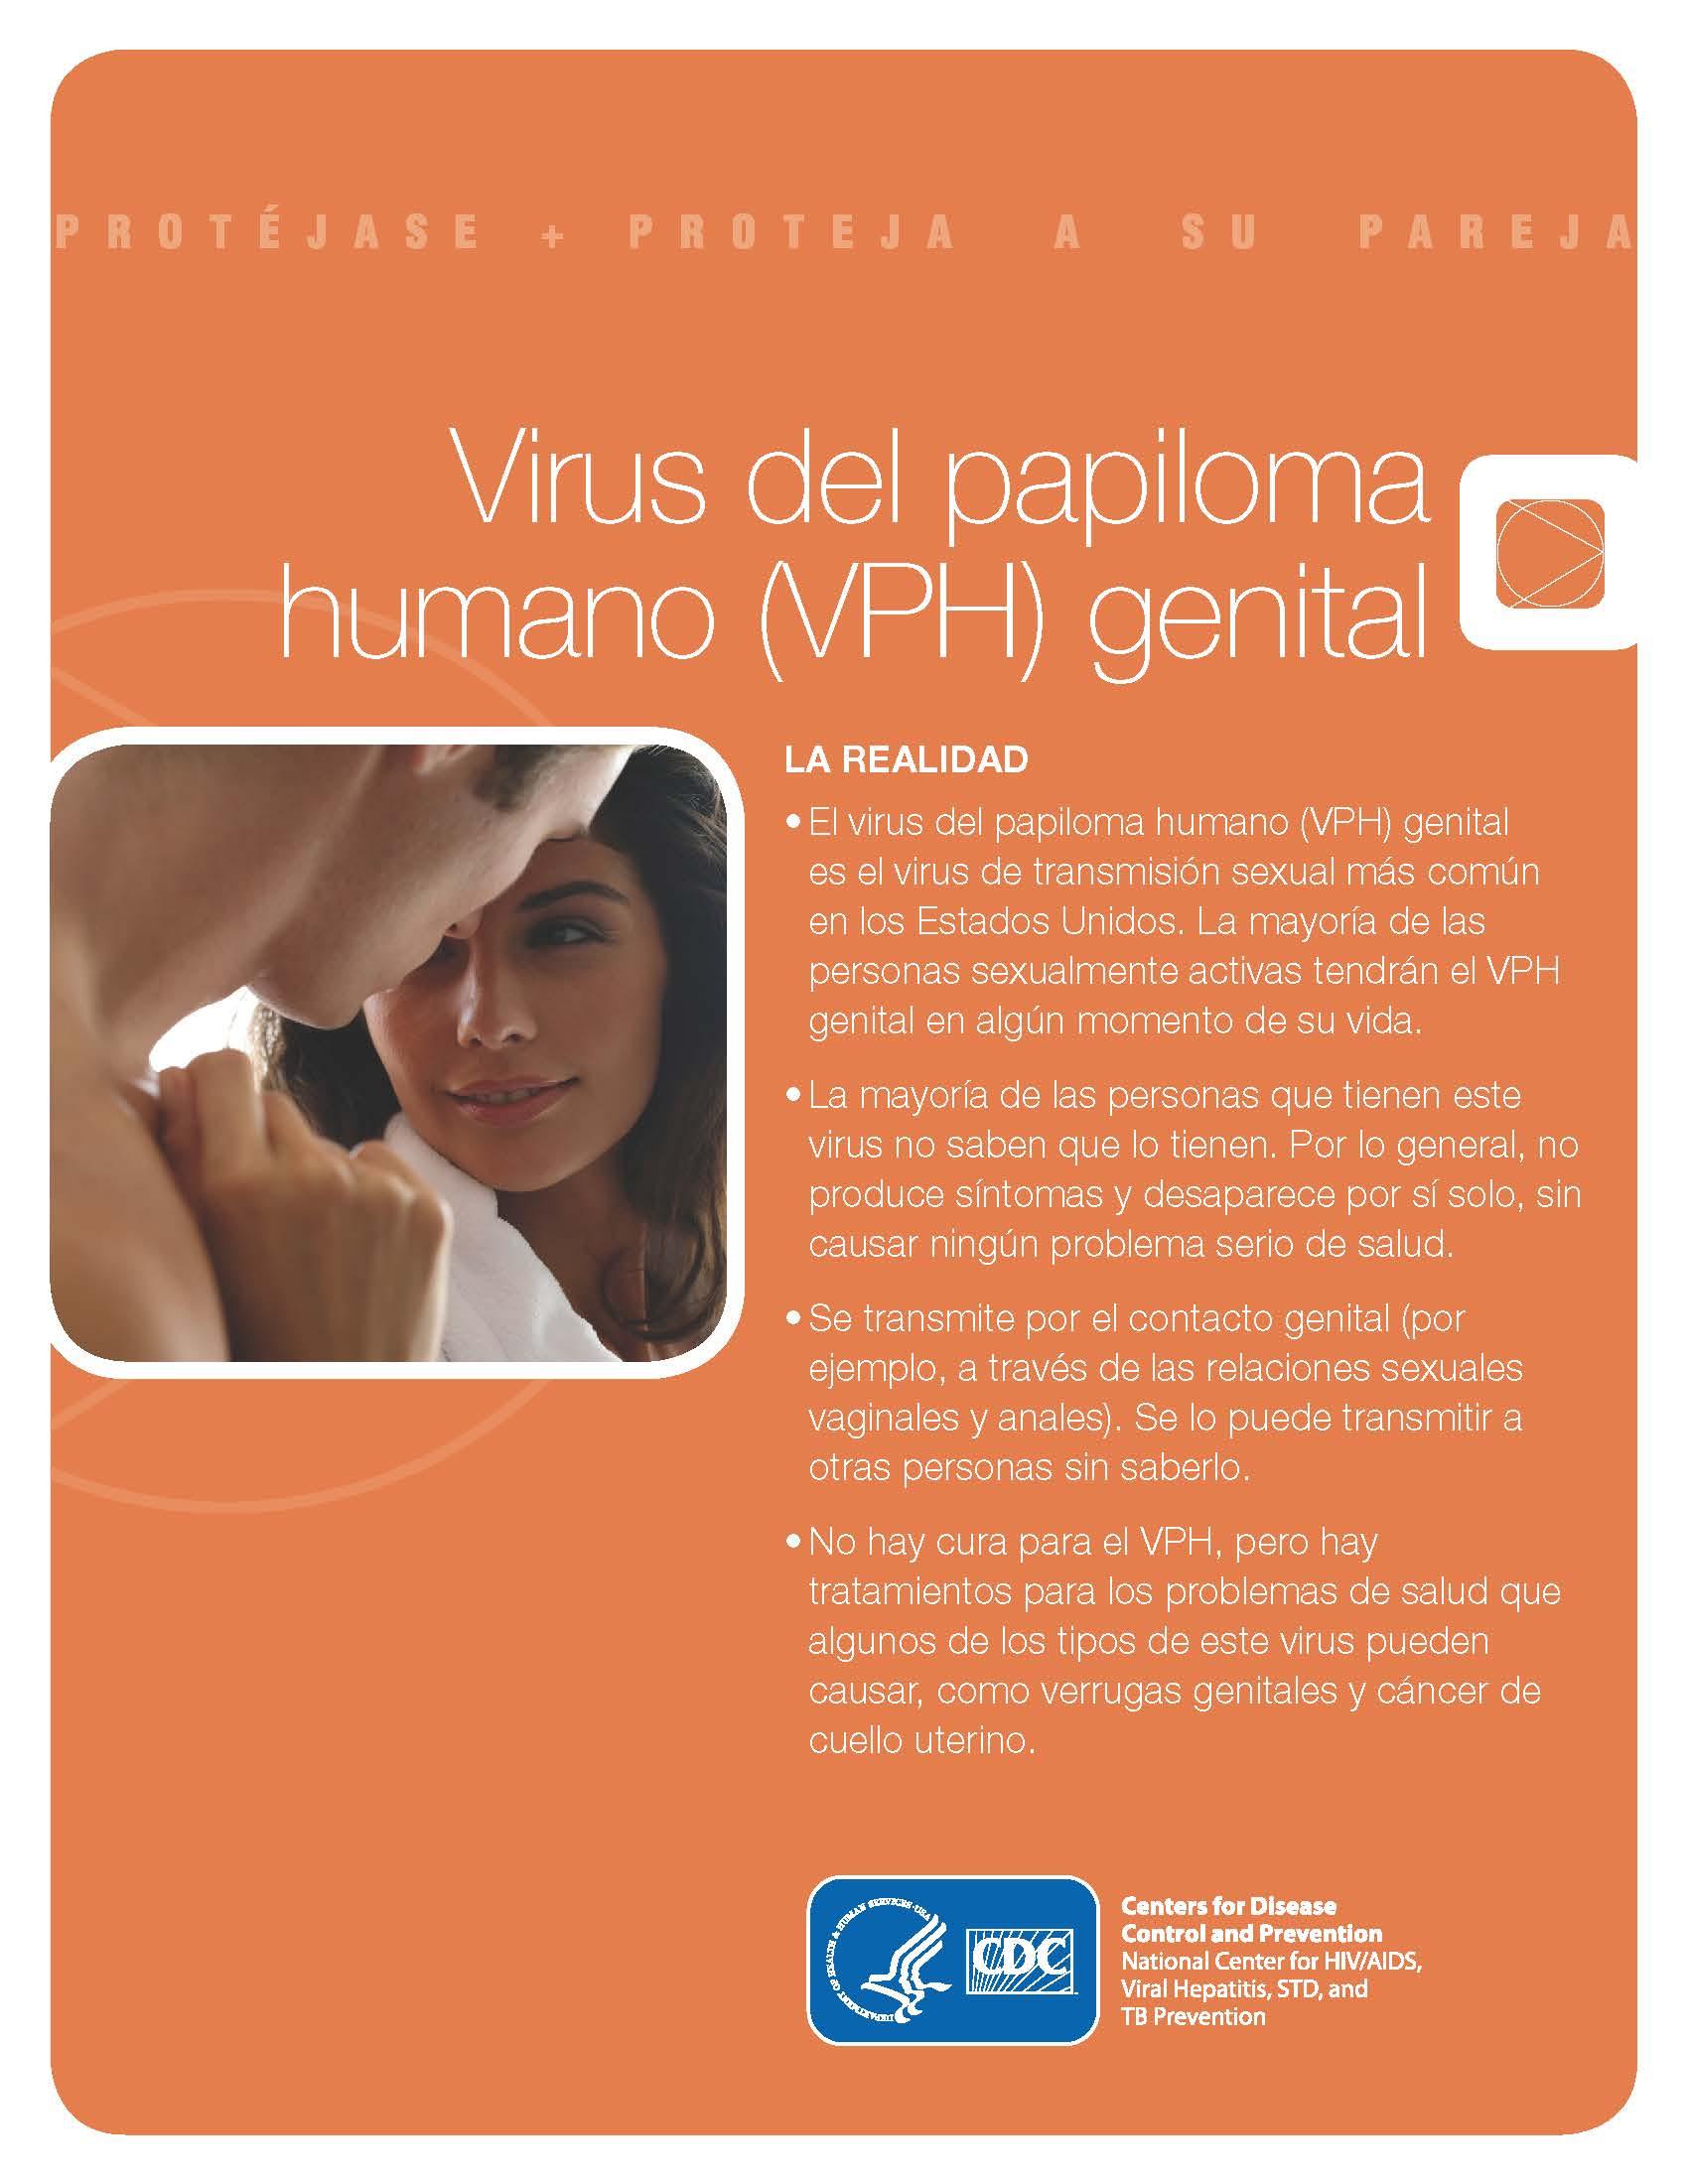 volante-Prevención-de-cáncer-de-cuello-uterino.docx